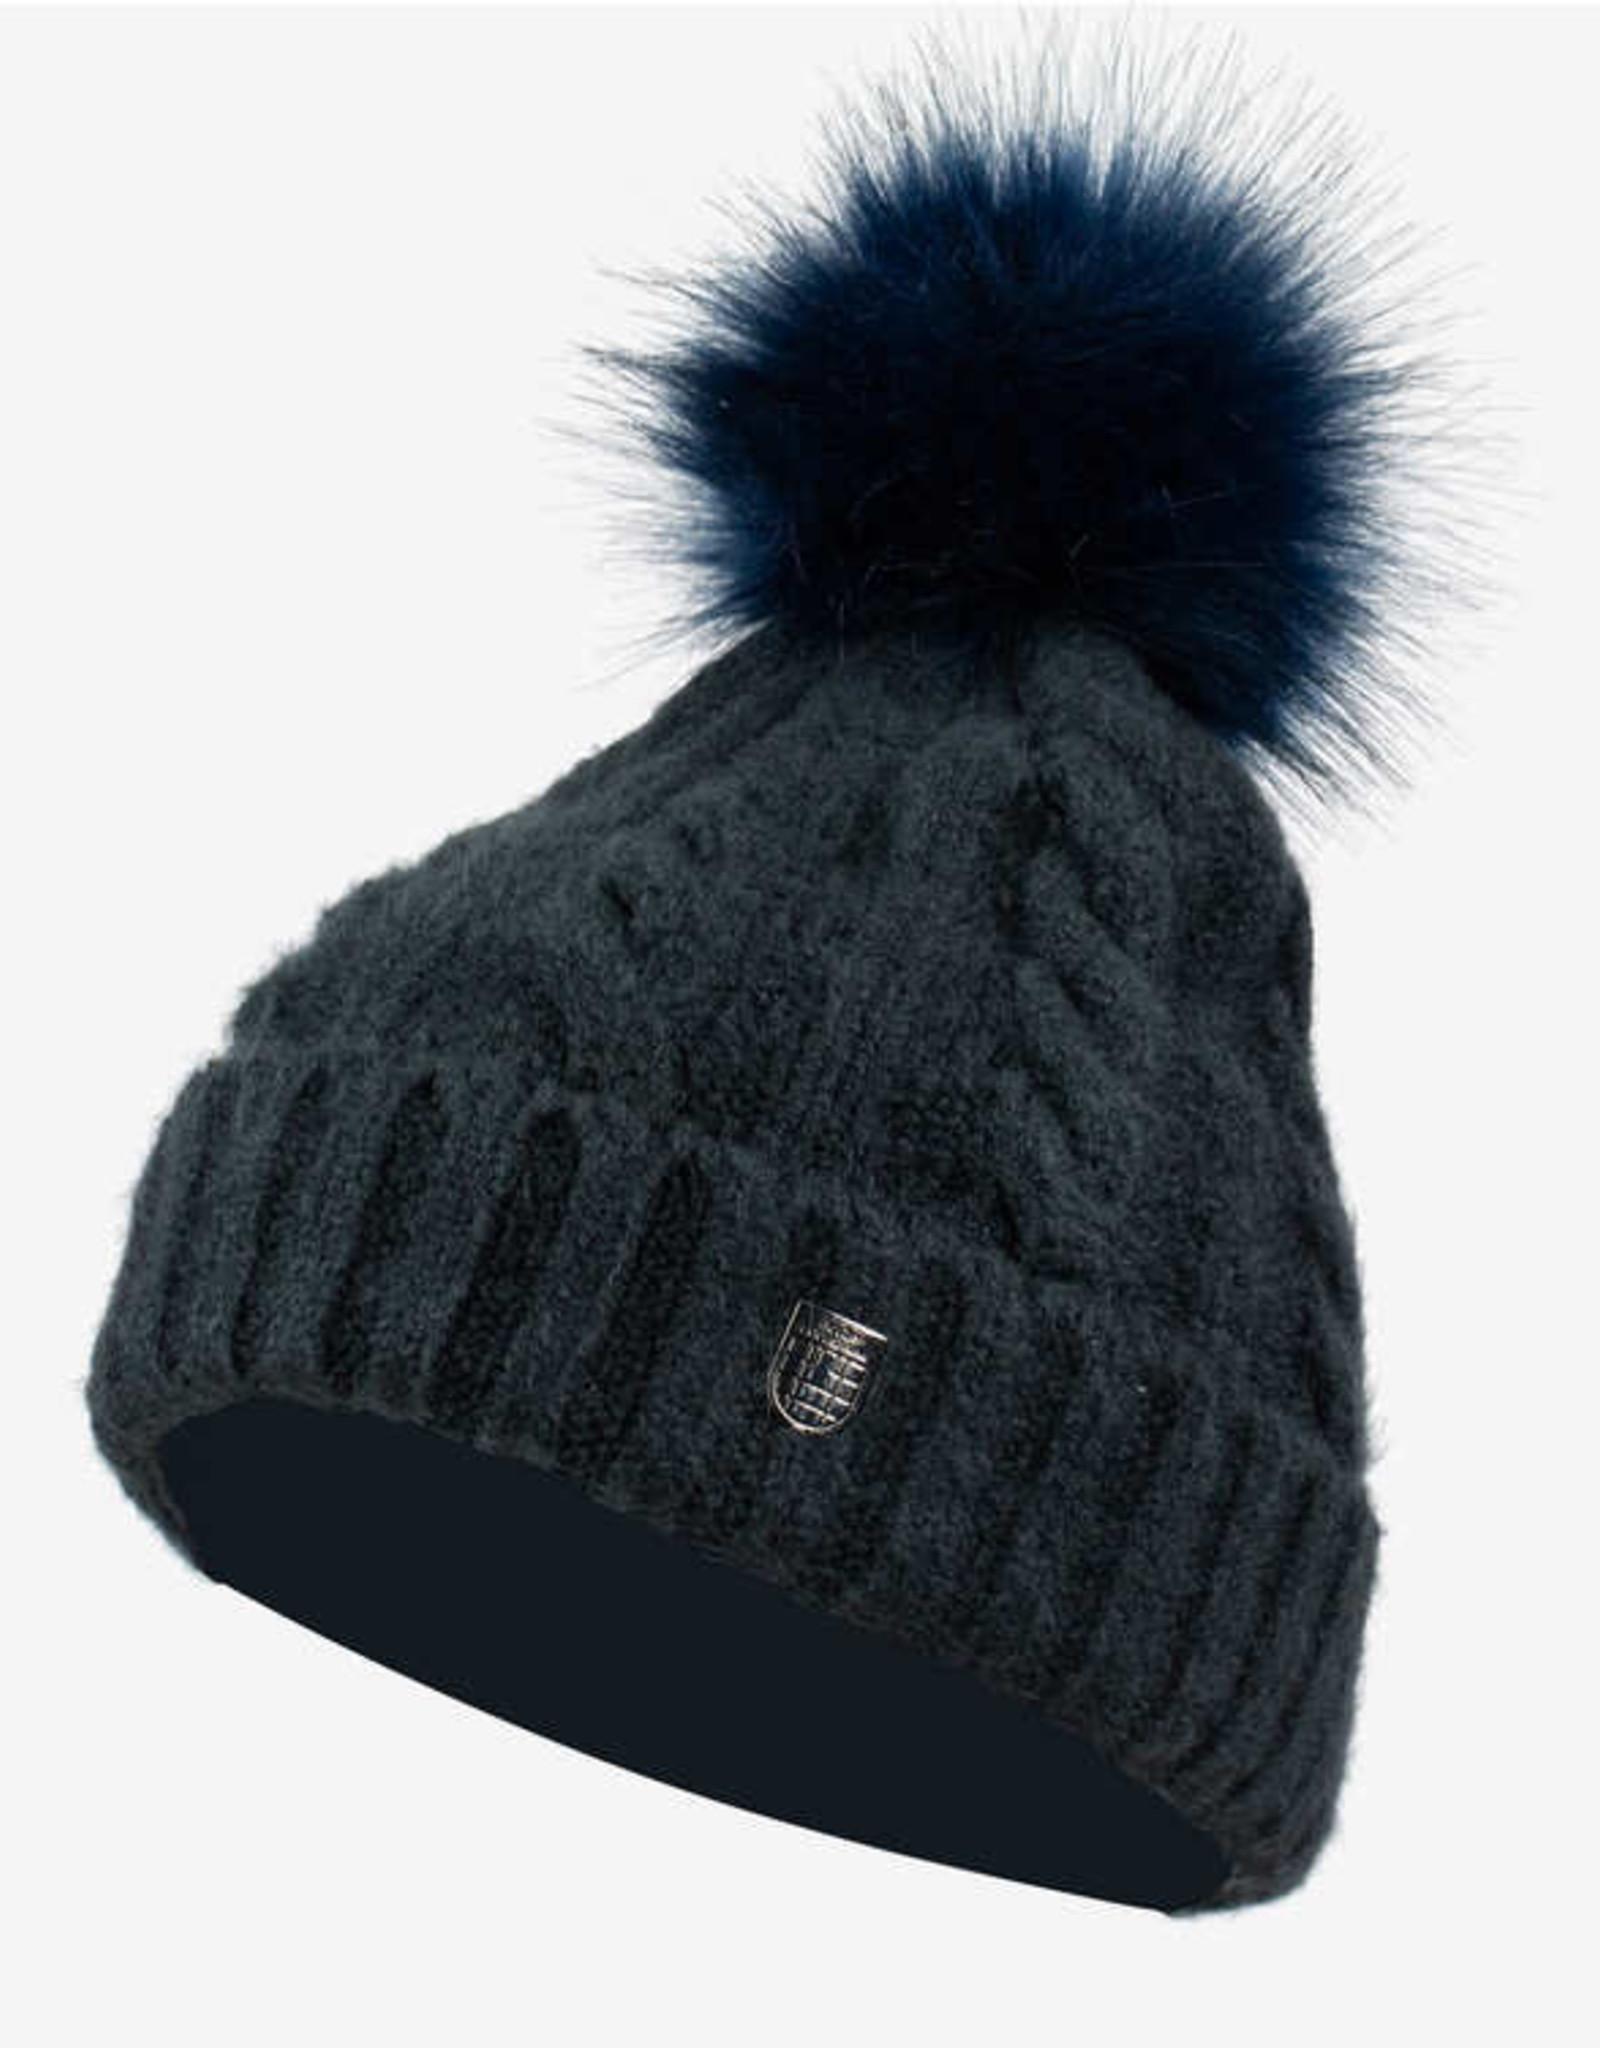 HORZE MADDOX WINTER HAT